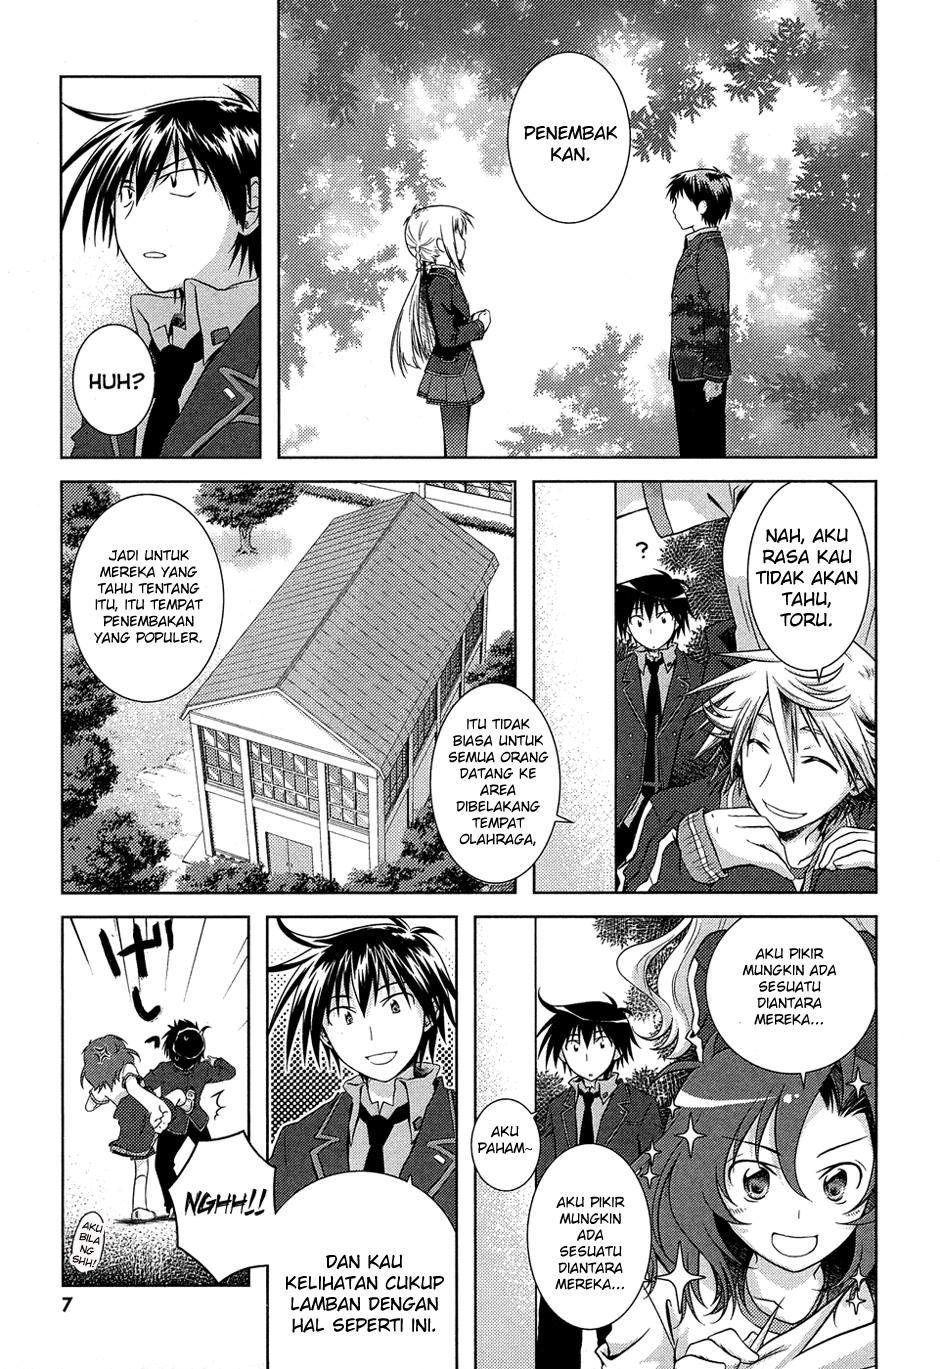 Komik iris zero 0010 11 Indonesia iris zero 0010 Terbaru 7|Baca Manga Komik Indonesia|